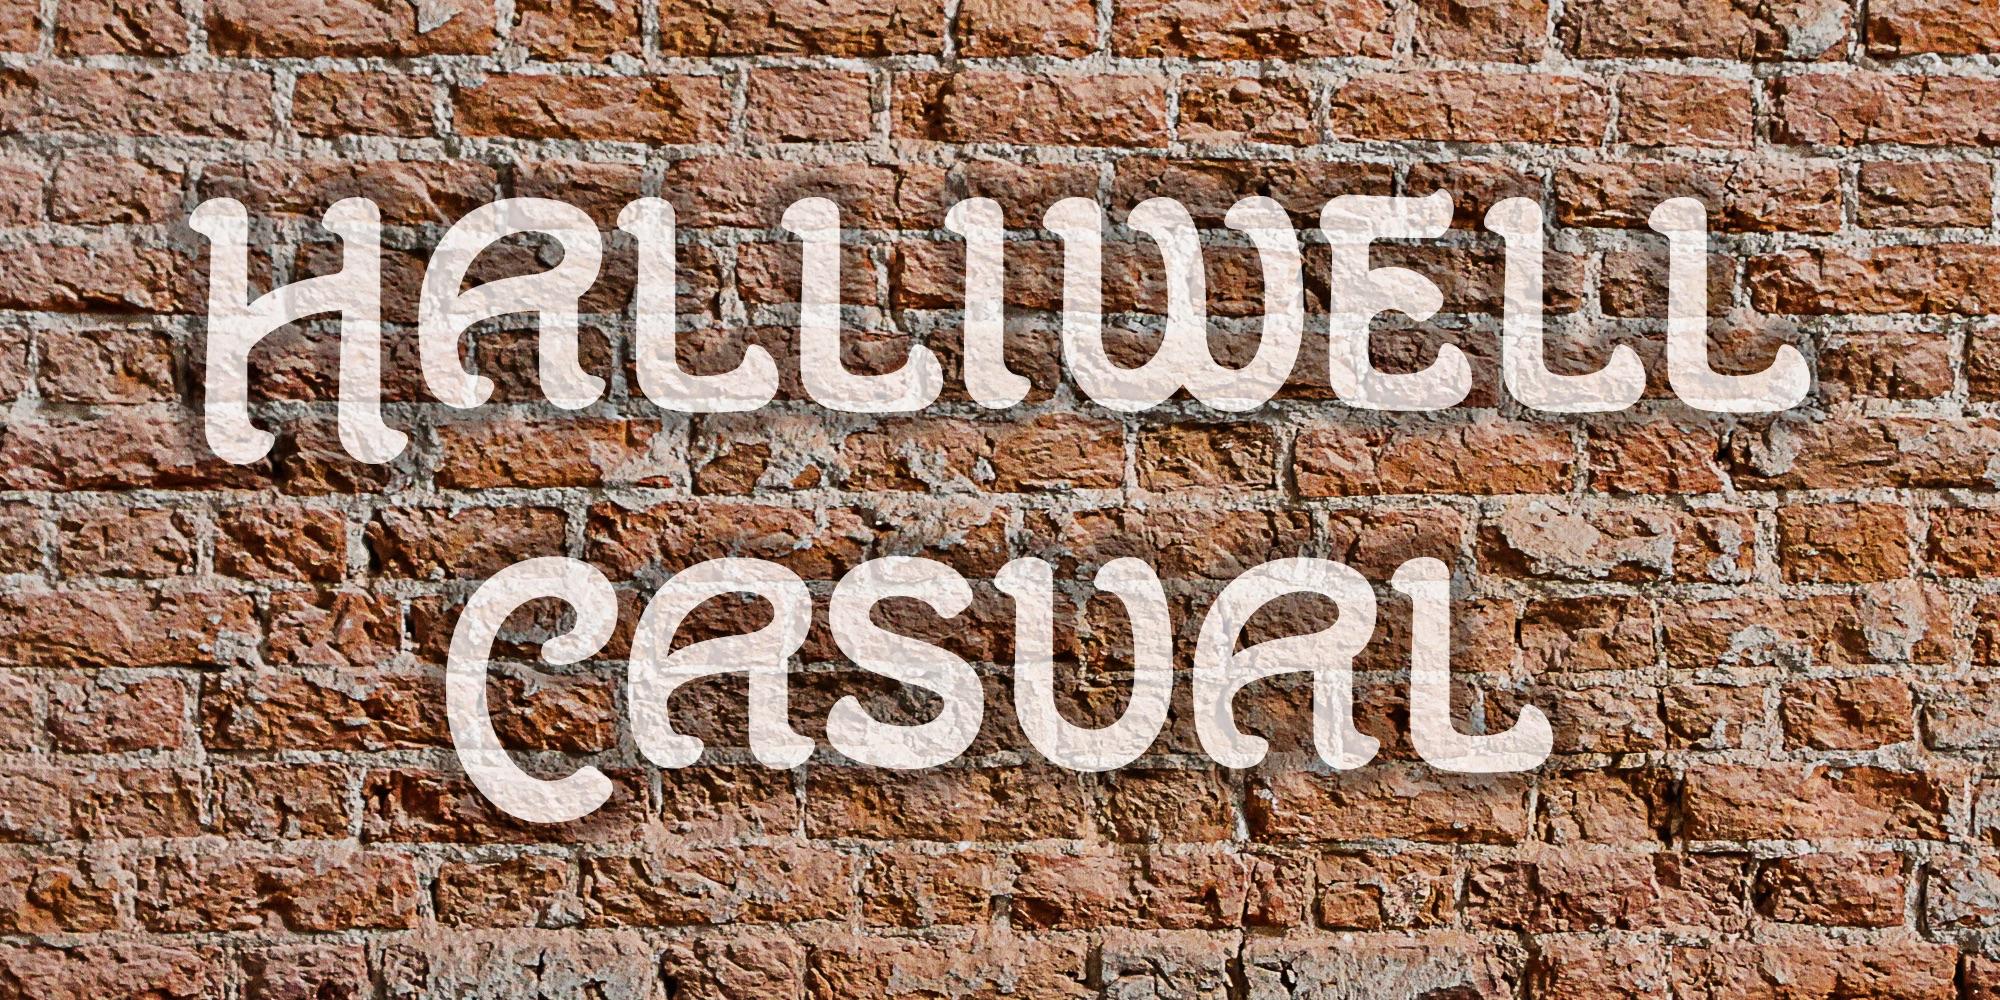 Halliwell Casual example image 9